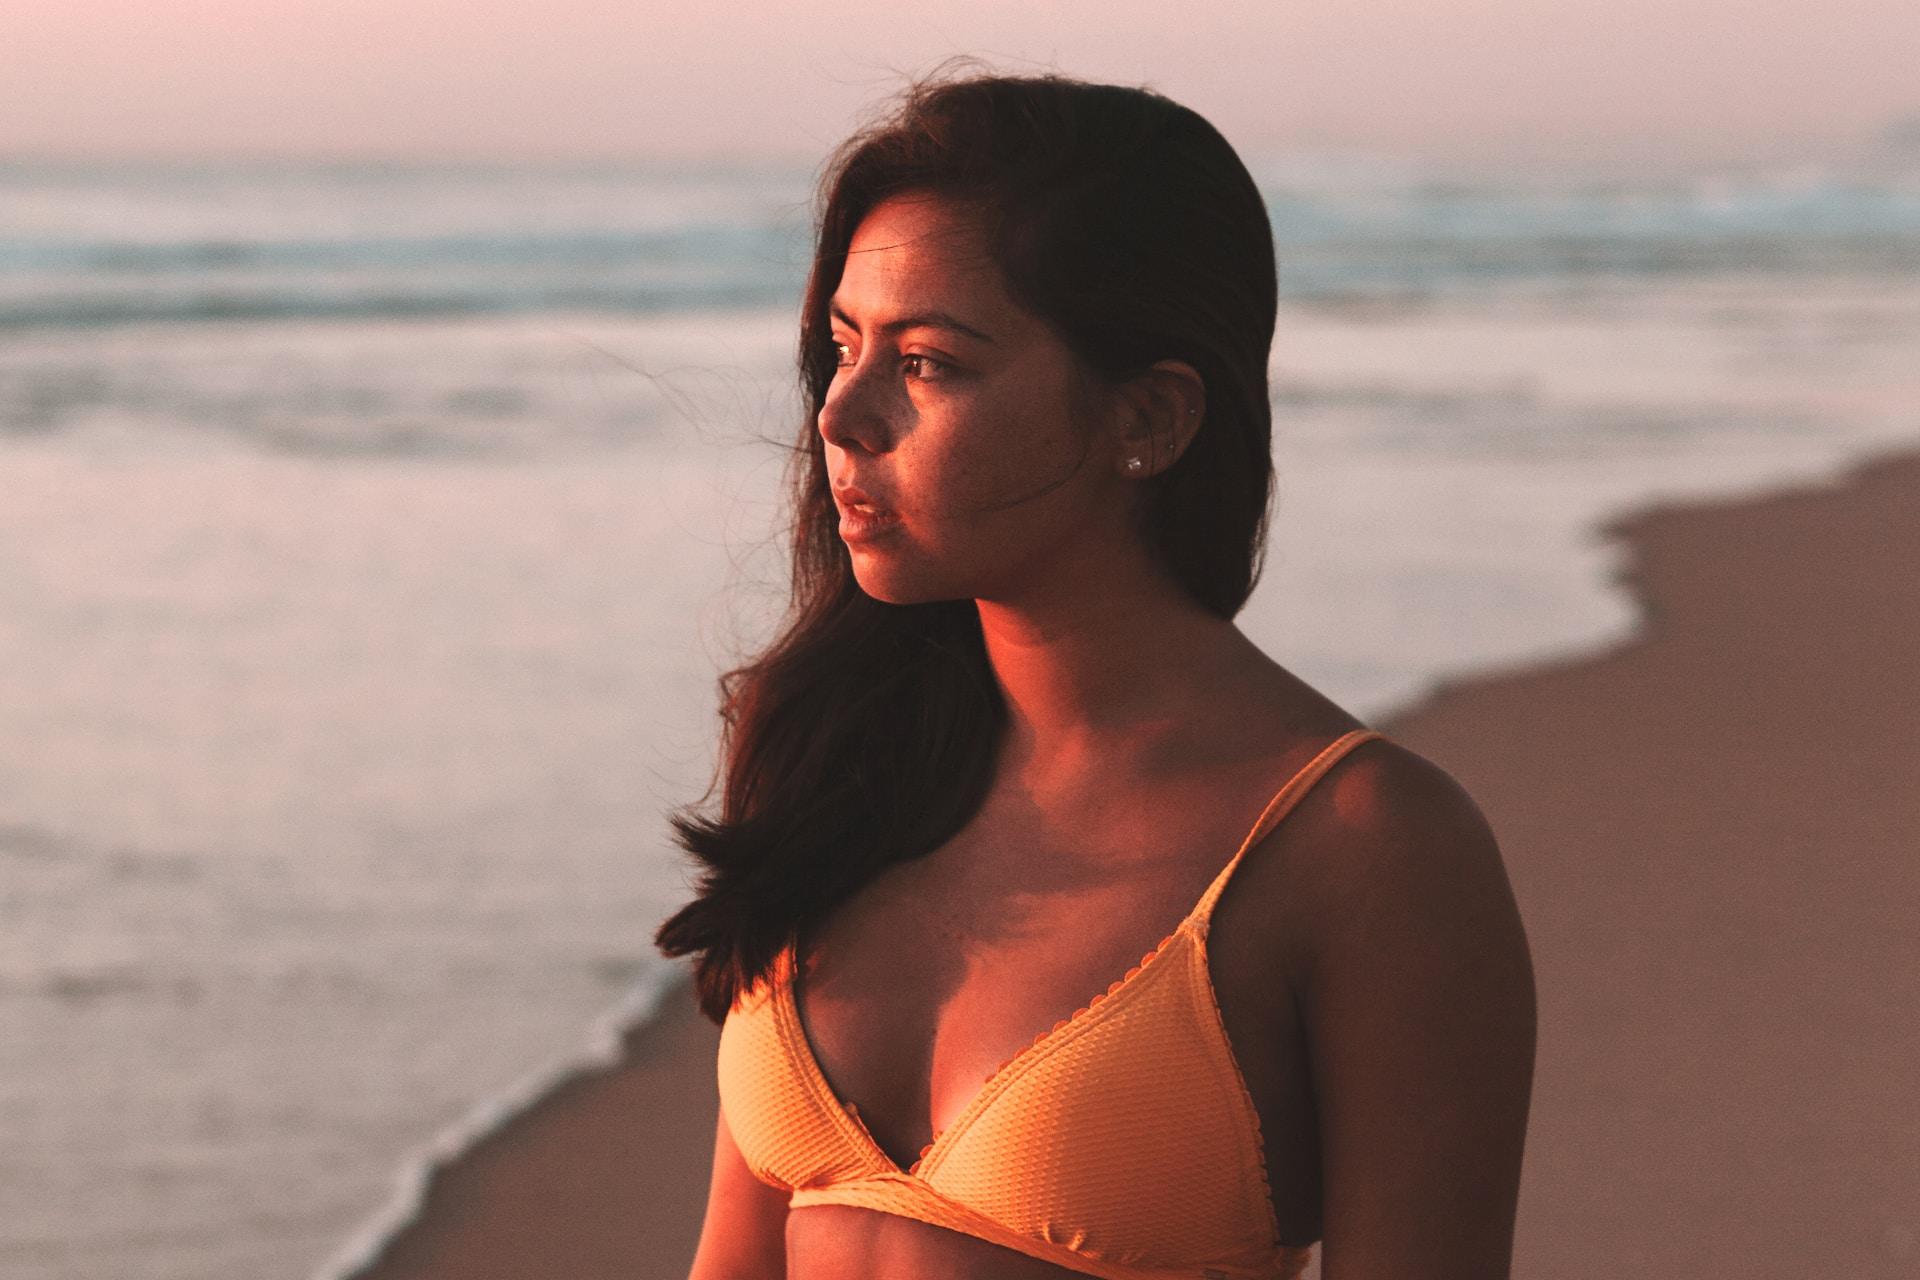 woman in white bikini top standing on beach during sunset